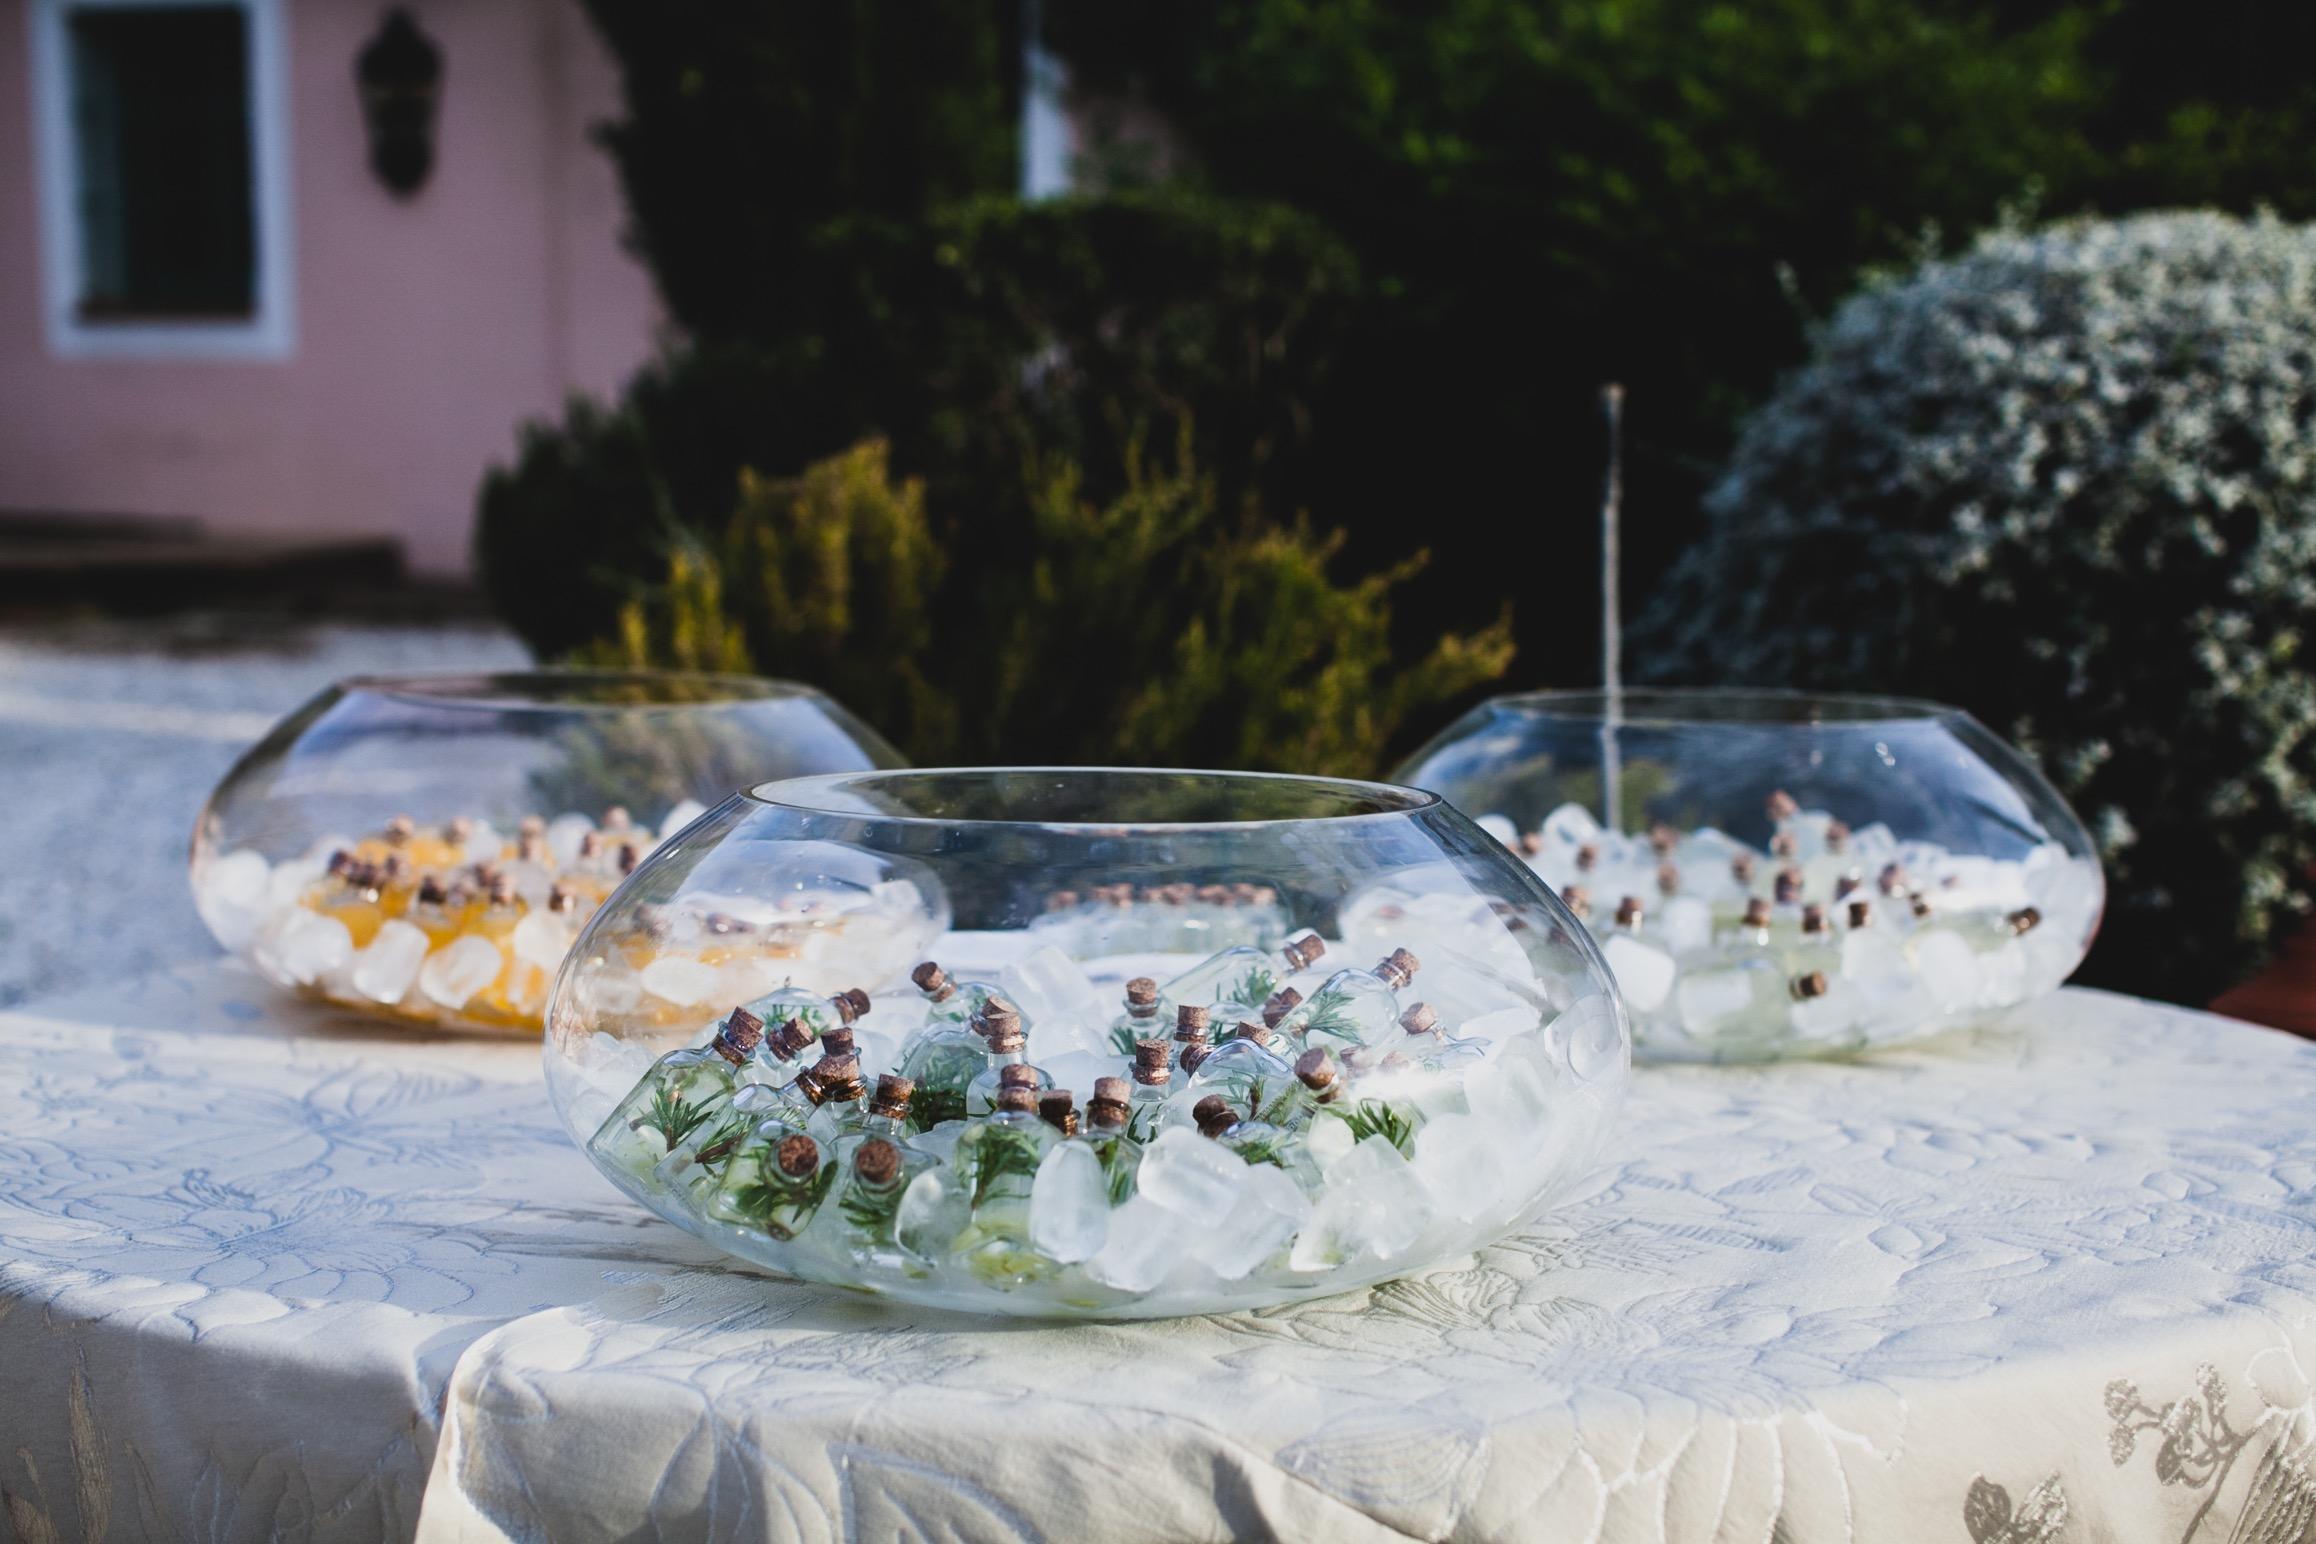 Si-Quiero-Wedding-Planner-By-Sira-Antequera-Bodas-Málaga-Marbella-Miami-Patricia-Juanlu-1